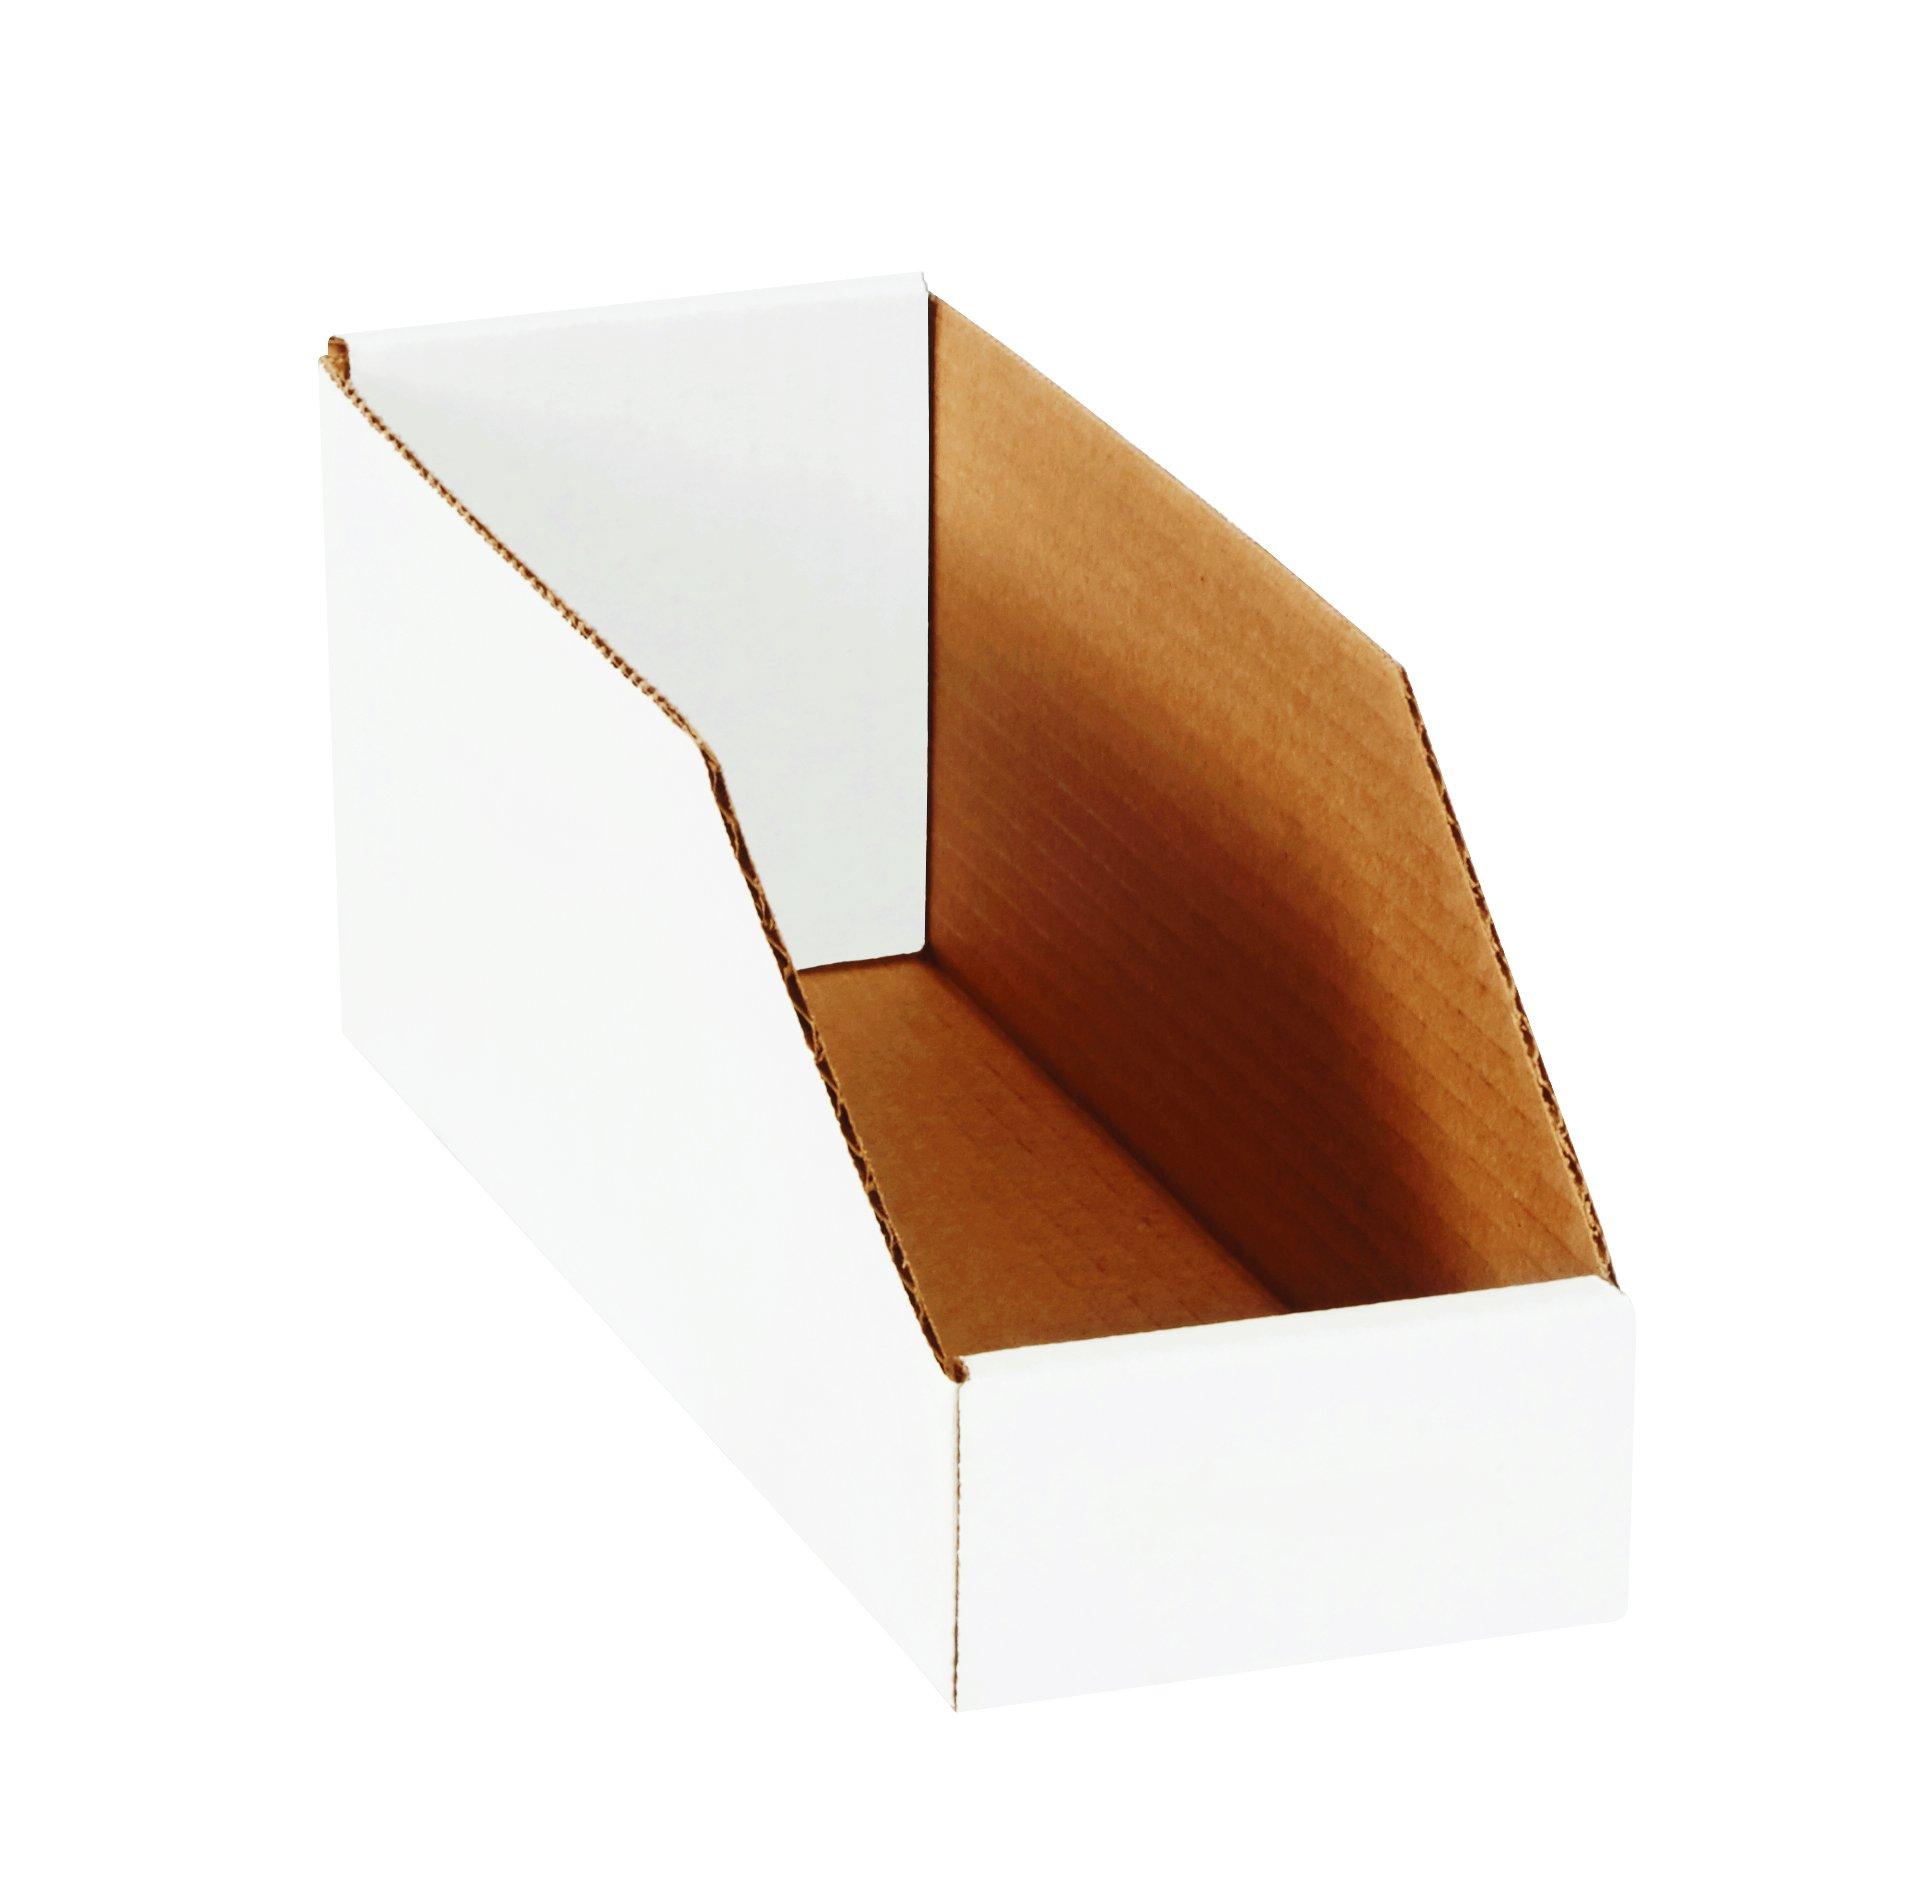 Aviditi BINMT412 Corrugated Open Top Bin Box, 12'' Length x 4'' Width x 4-1/2'' Height, Oyster White (Case of 50) by Aviditi